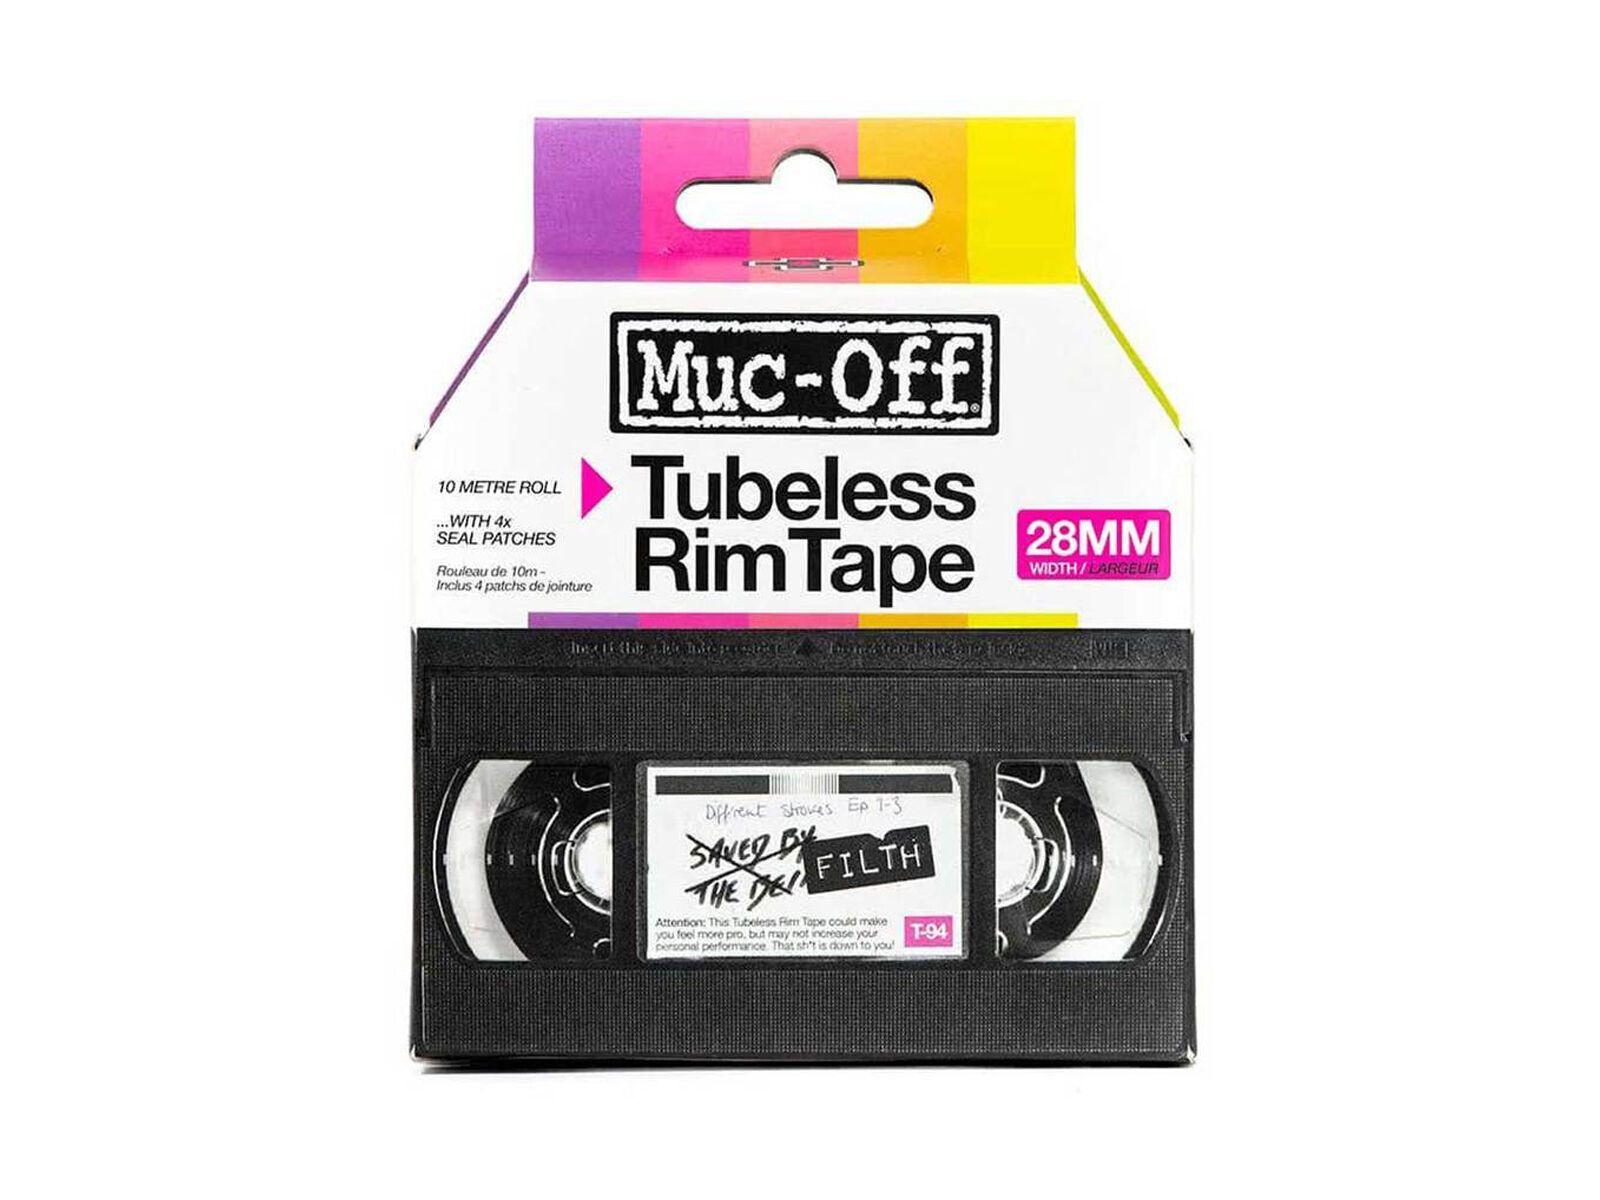 Muc-Off Tubeless Rim Tape - 28 mm MU-TIR-2068/36/28